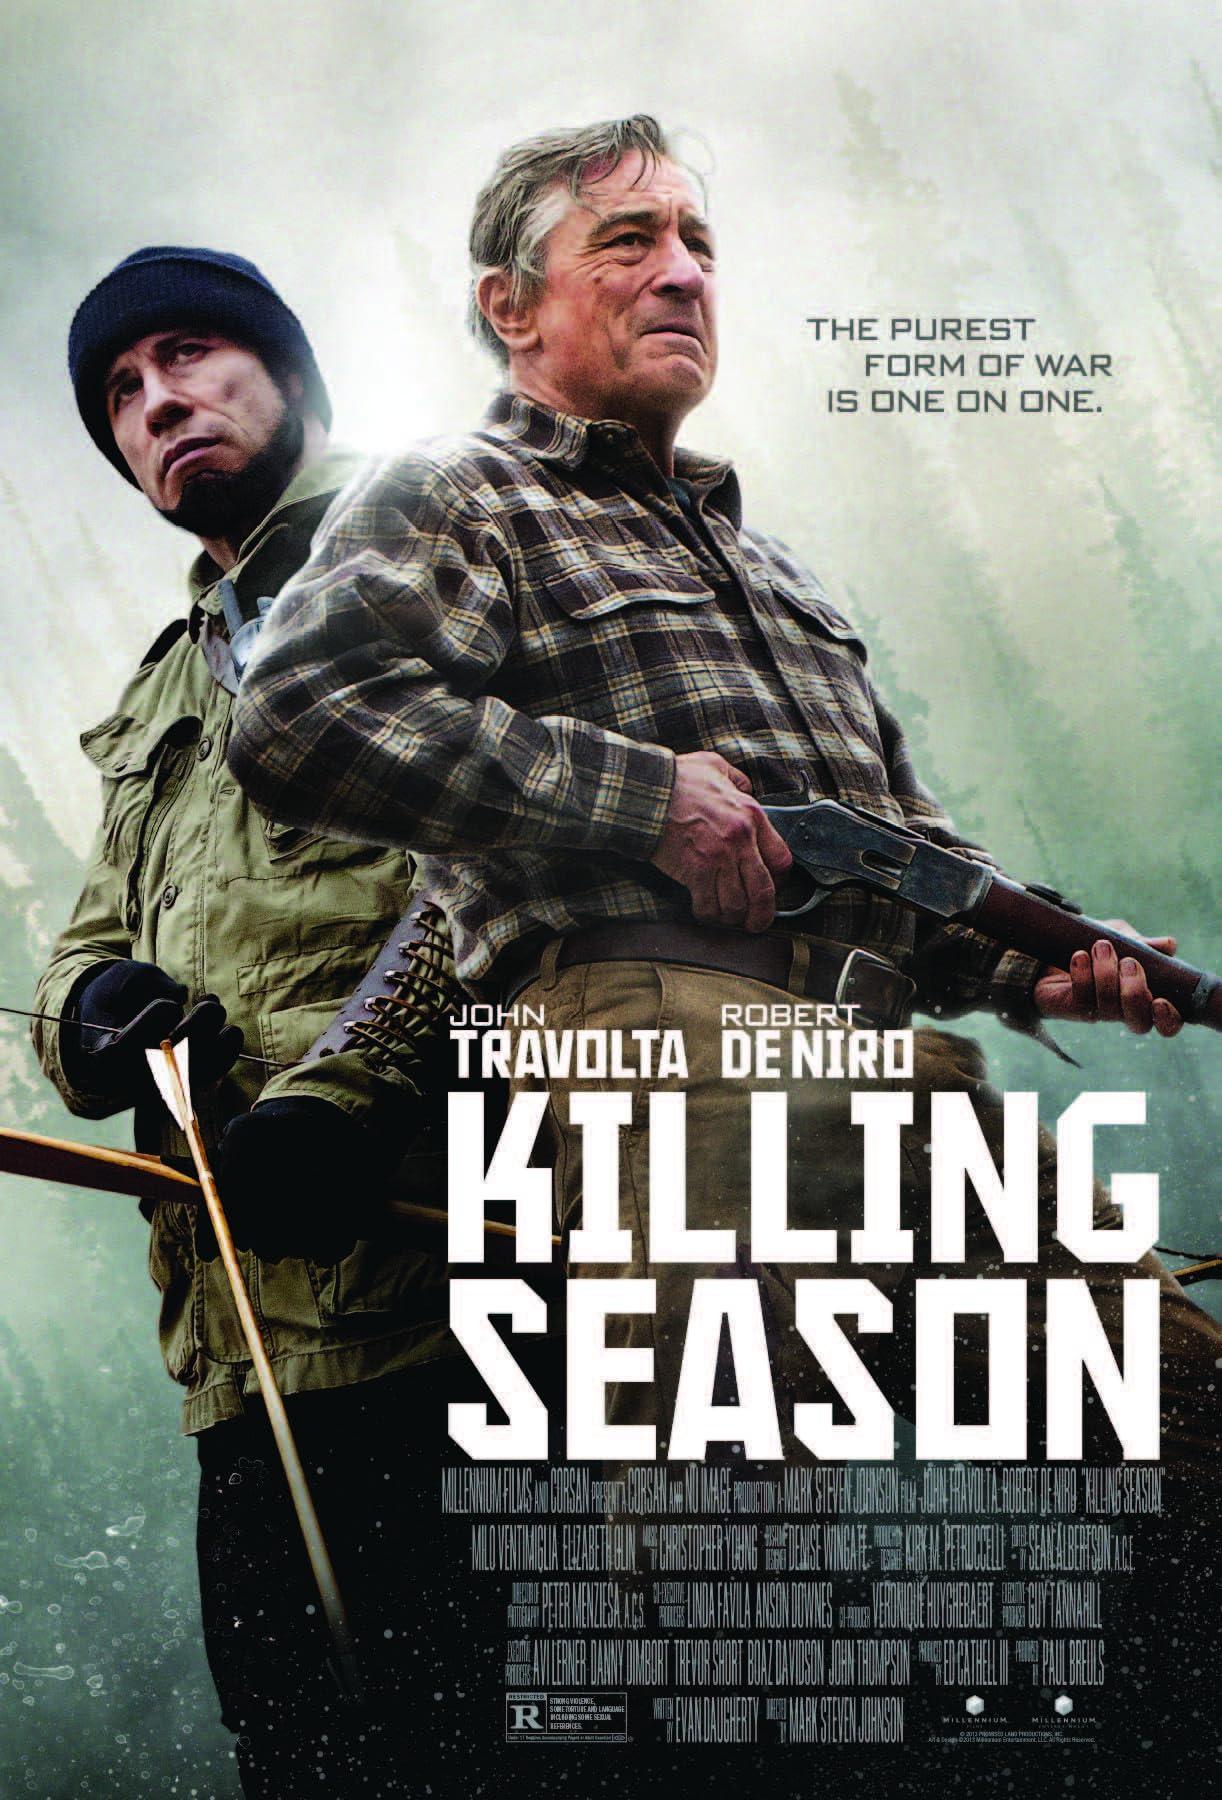 Killing Season (2013) Hindi Dubbed